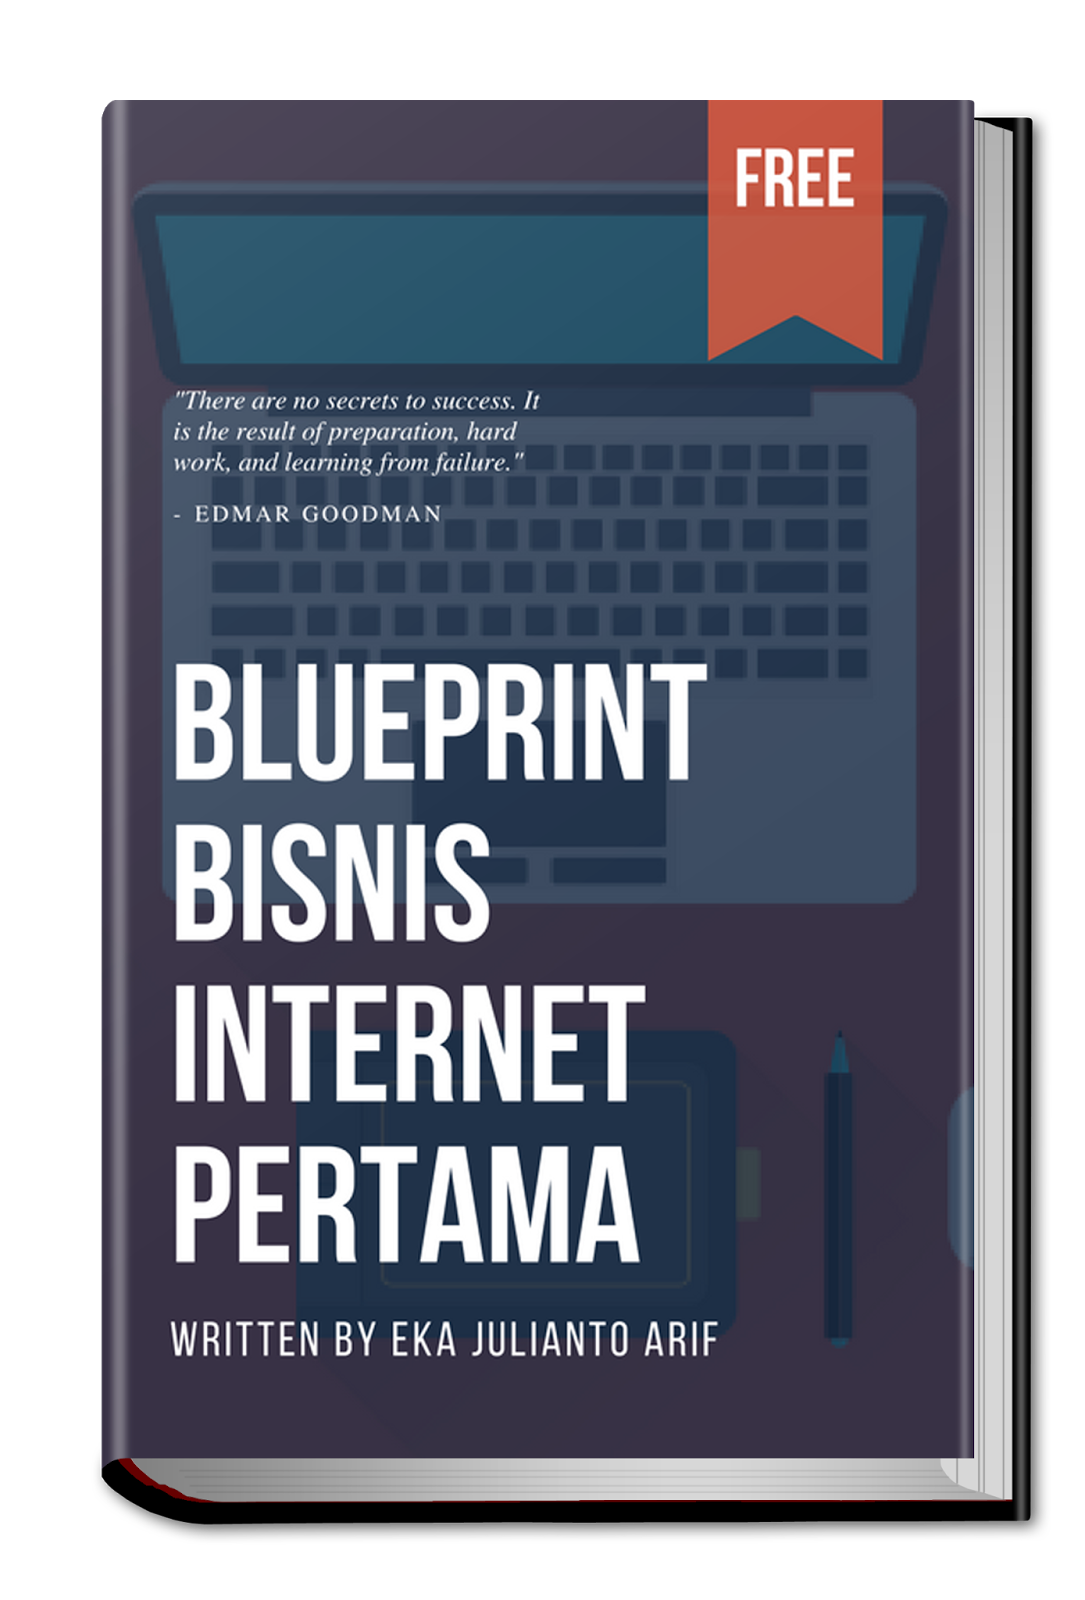 blueprint,bisnis internet